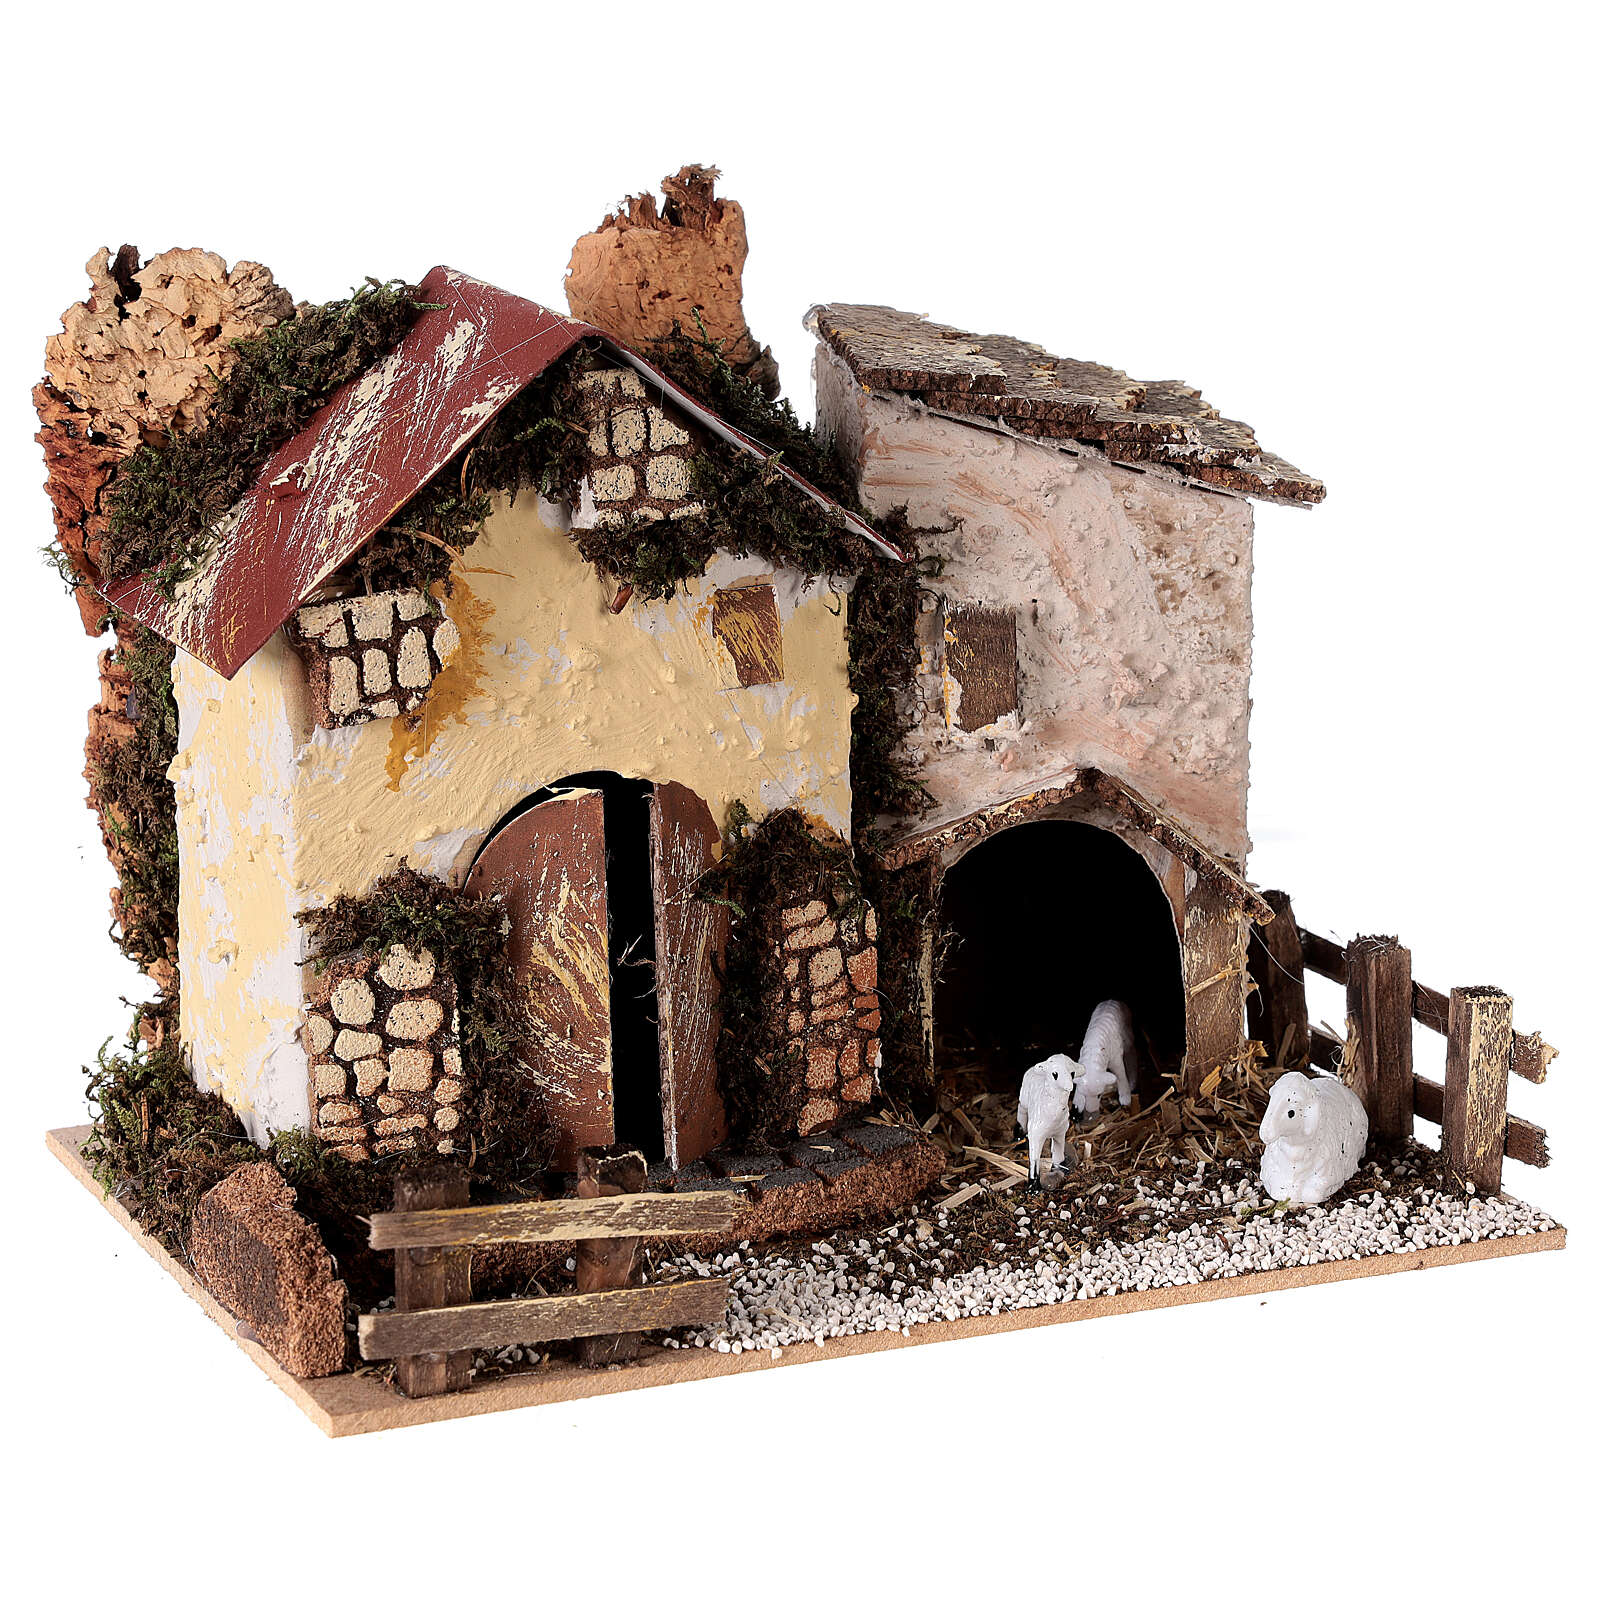 Farmhouse figurine with sheep 15x20x15 cm for 8-10 cm nativity scene 4